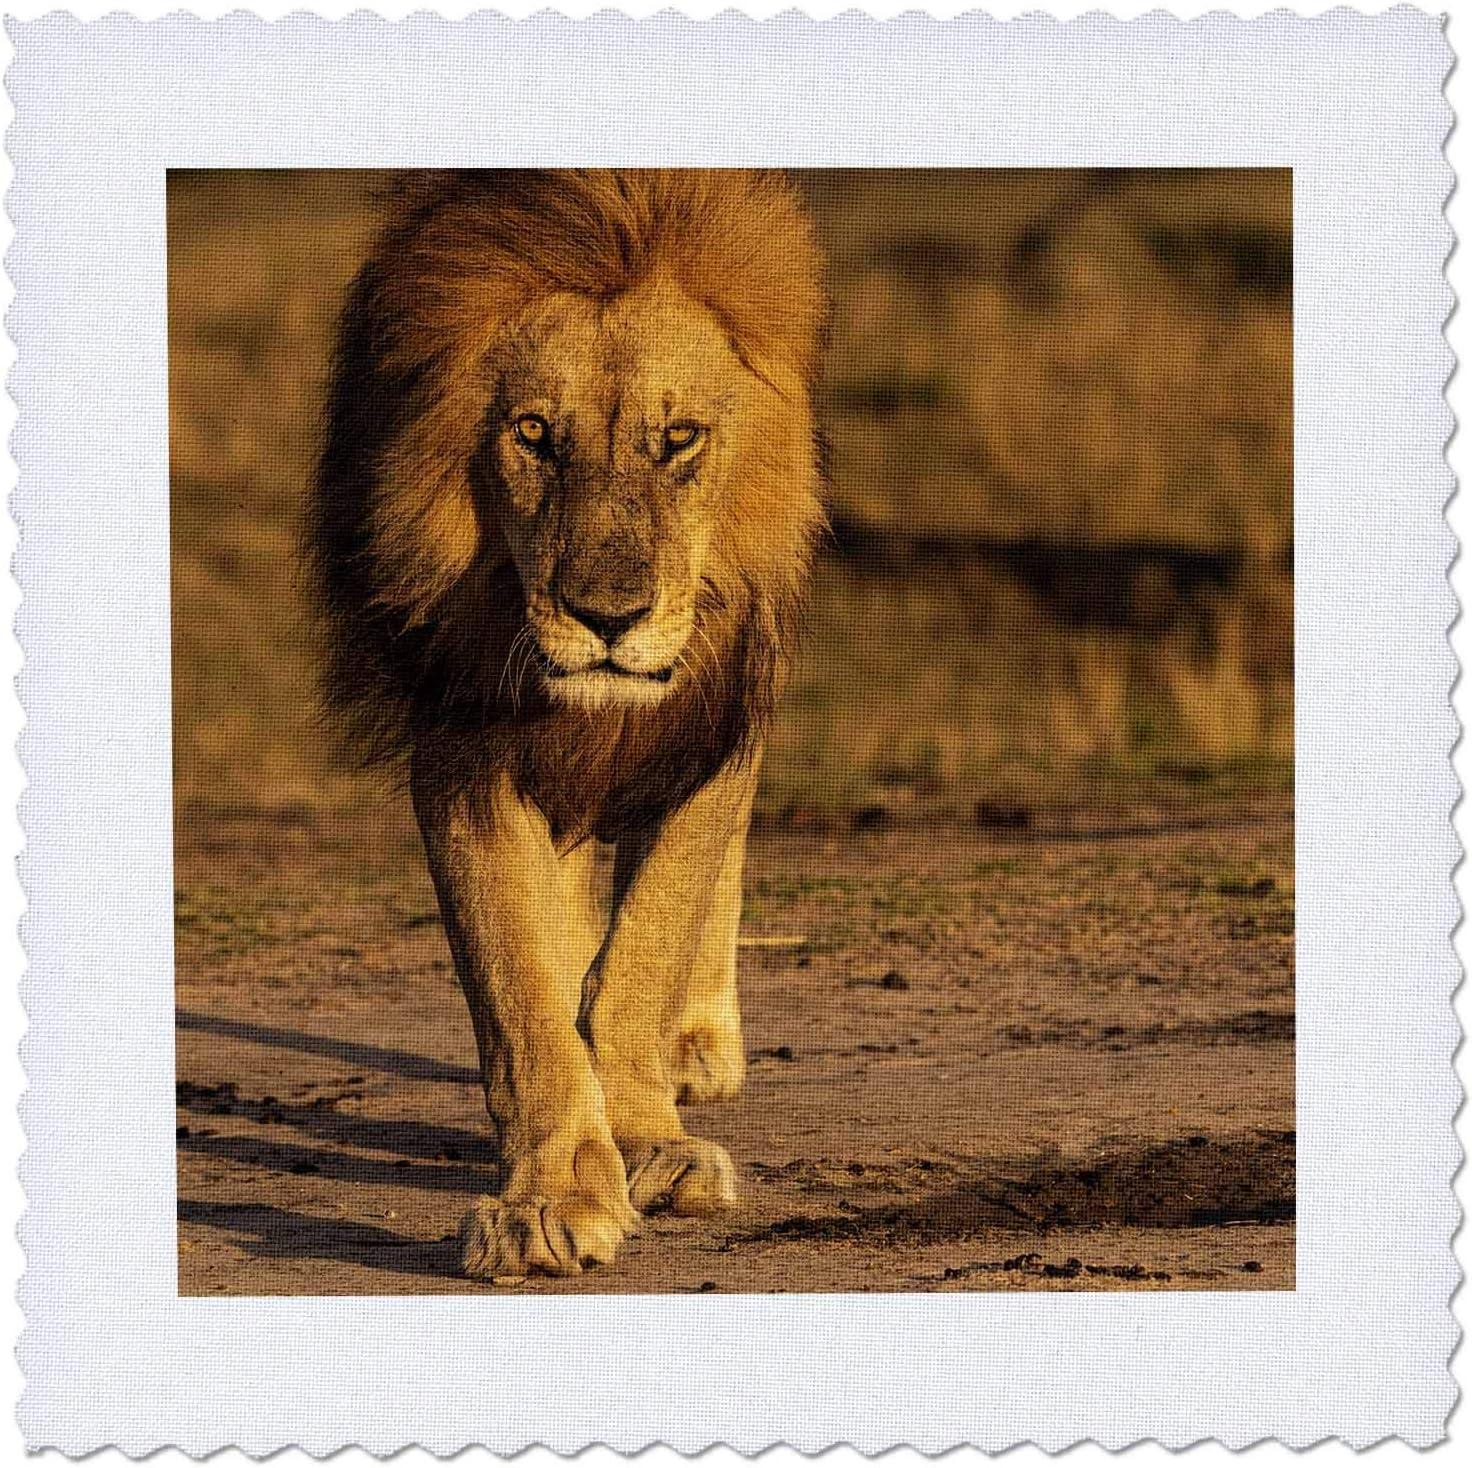 3dRose Max 69% OFF Tanzania Serengeti NP. Fees free!! Male lion - up. Quilt Squar Close